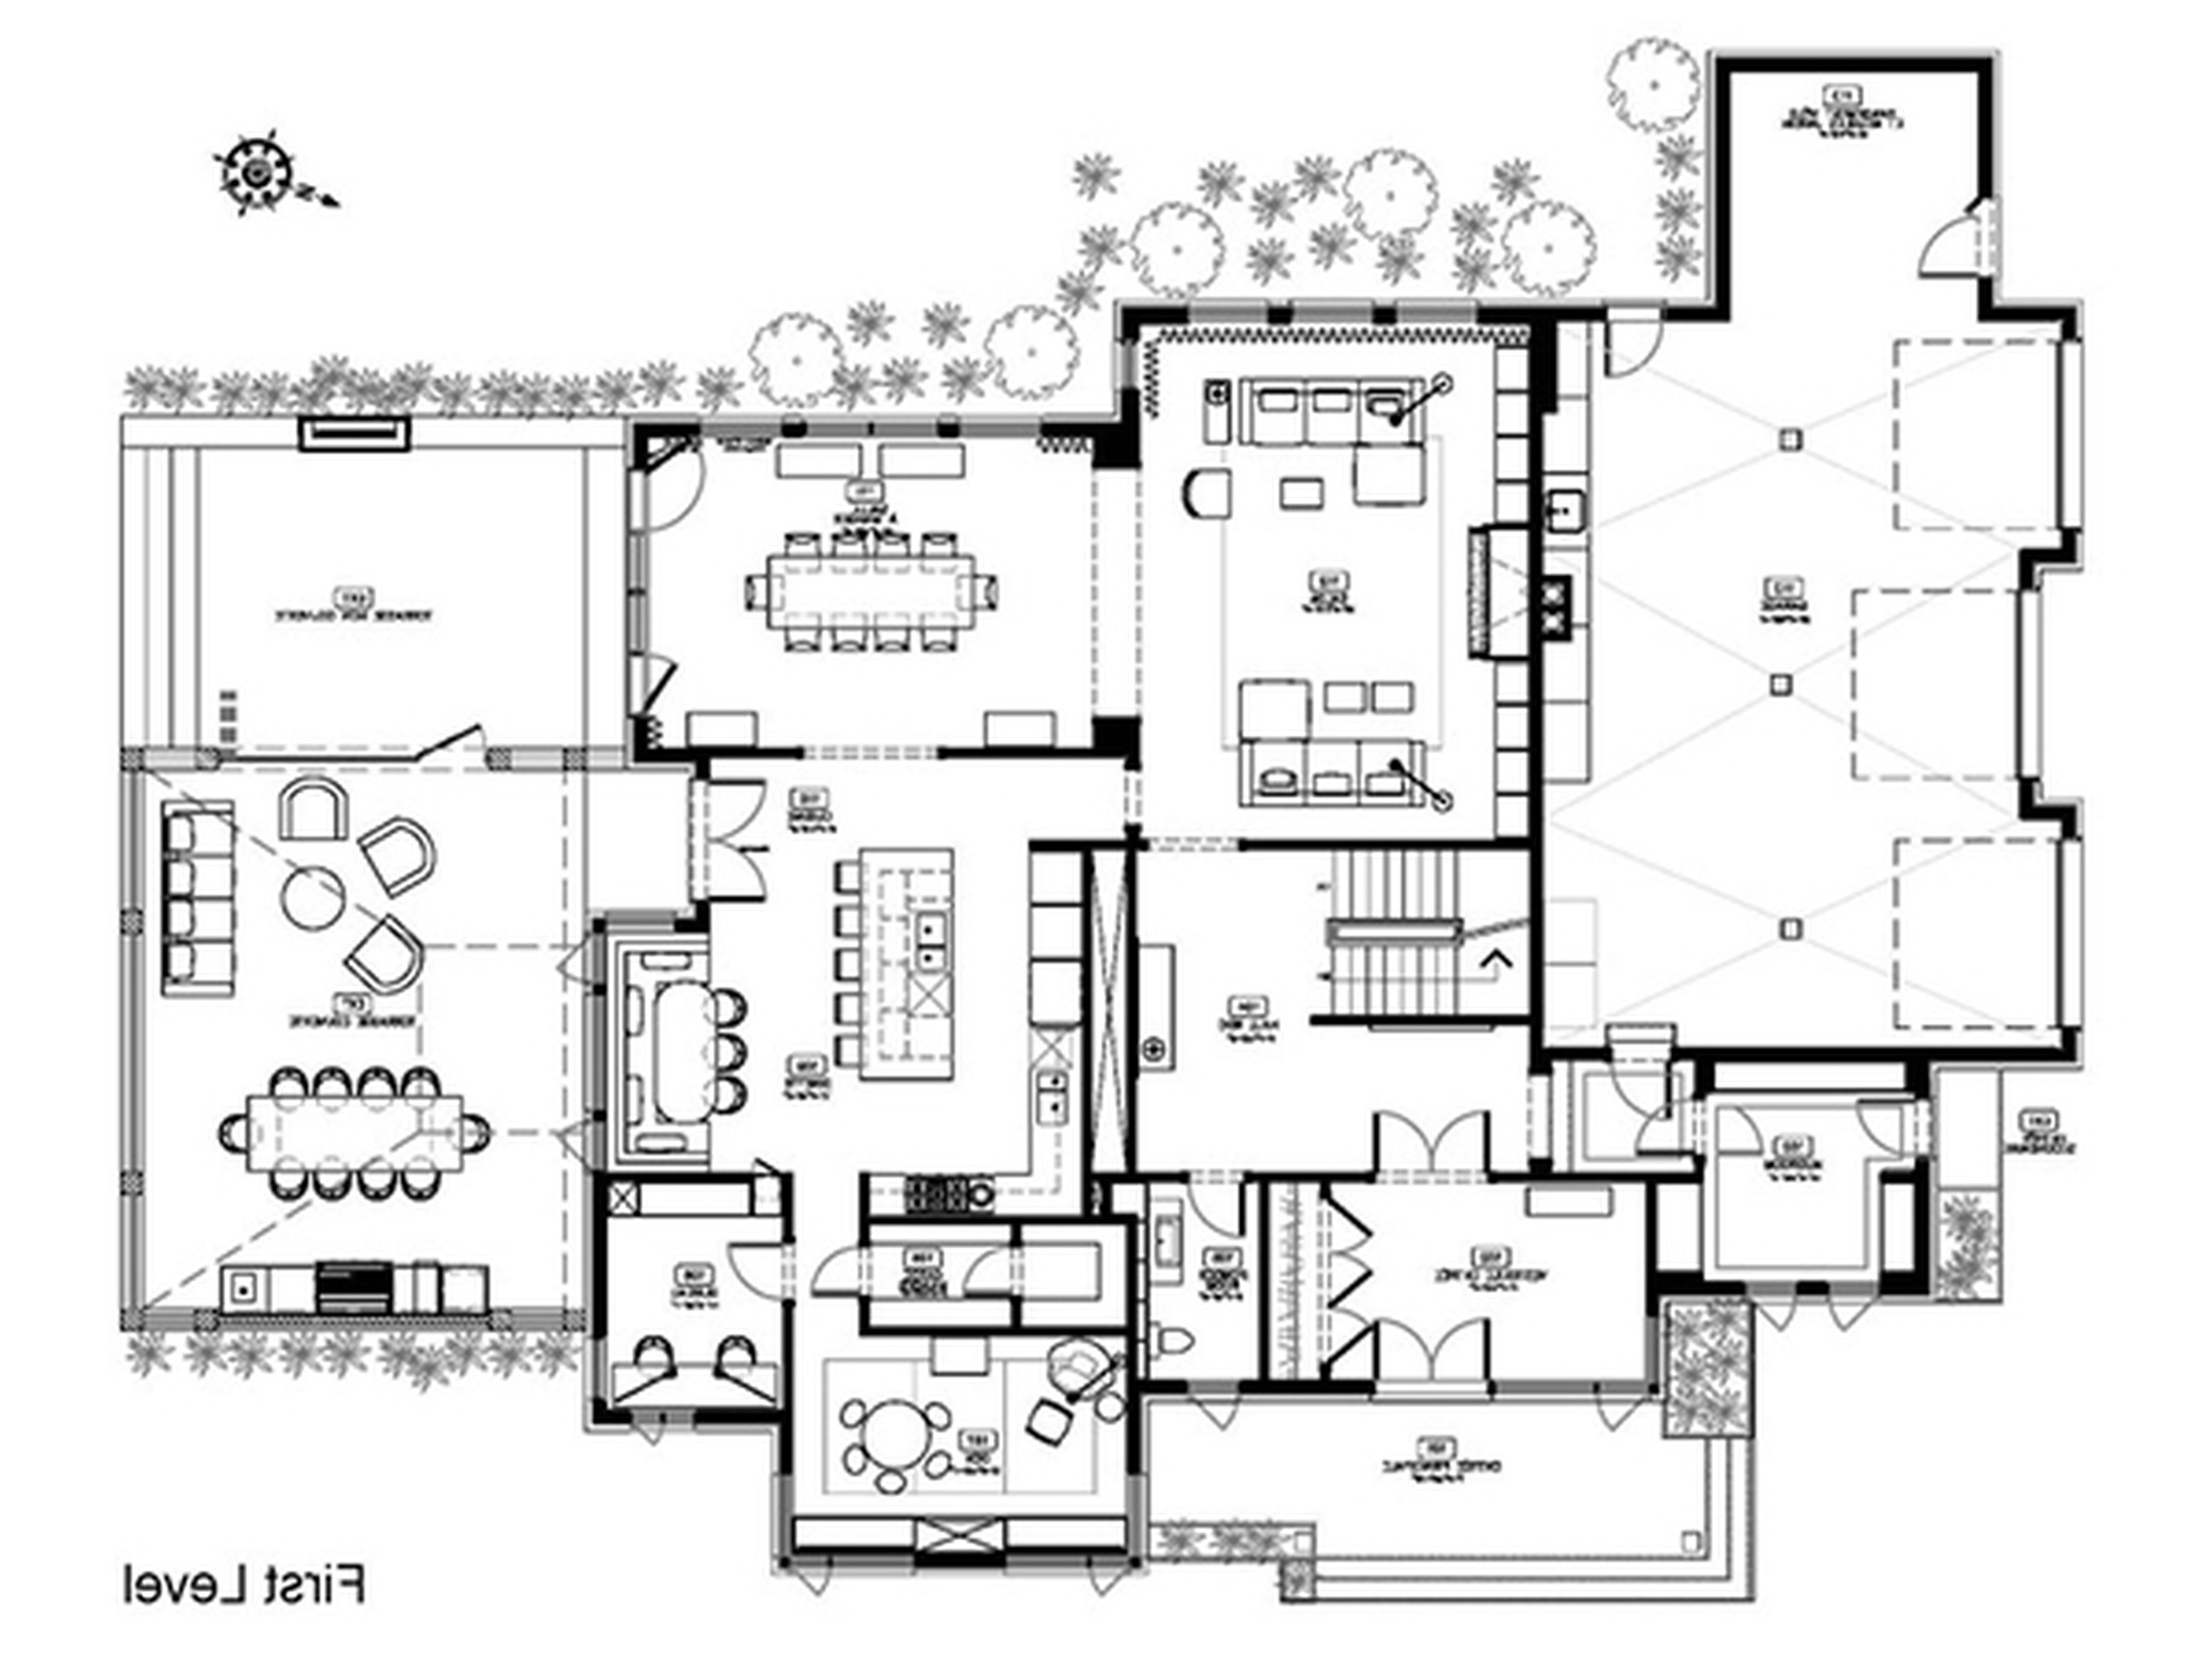 Cool modern house plans - Architecture Black Houses Architect Architectural Design Lovable Concrete House Plans Designs Modern Plan